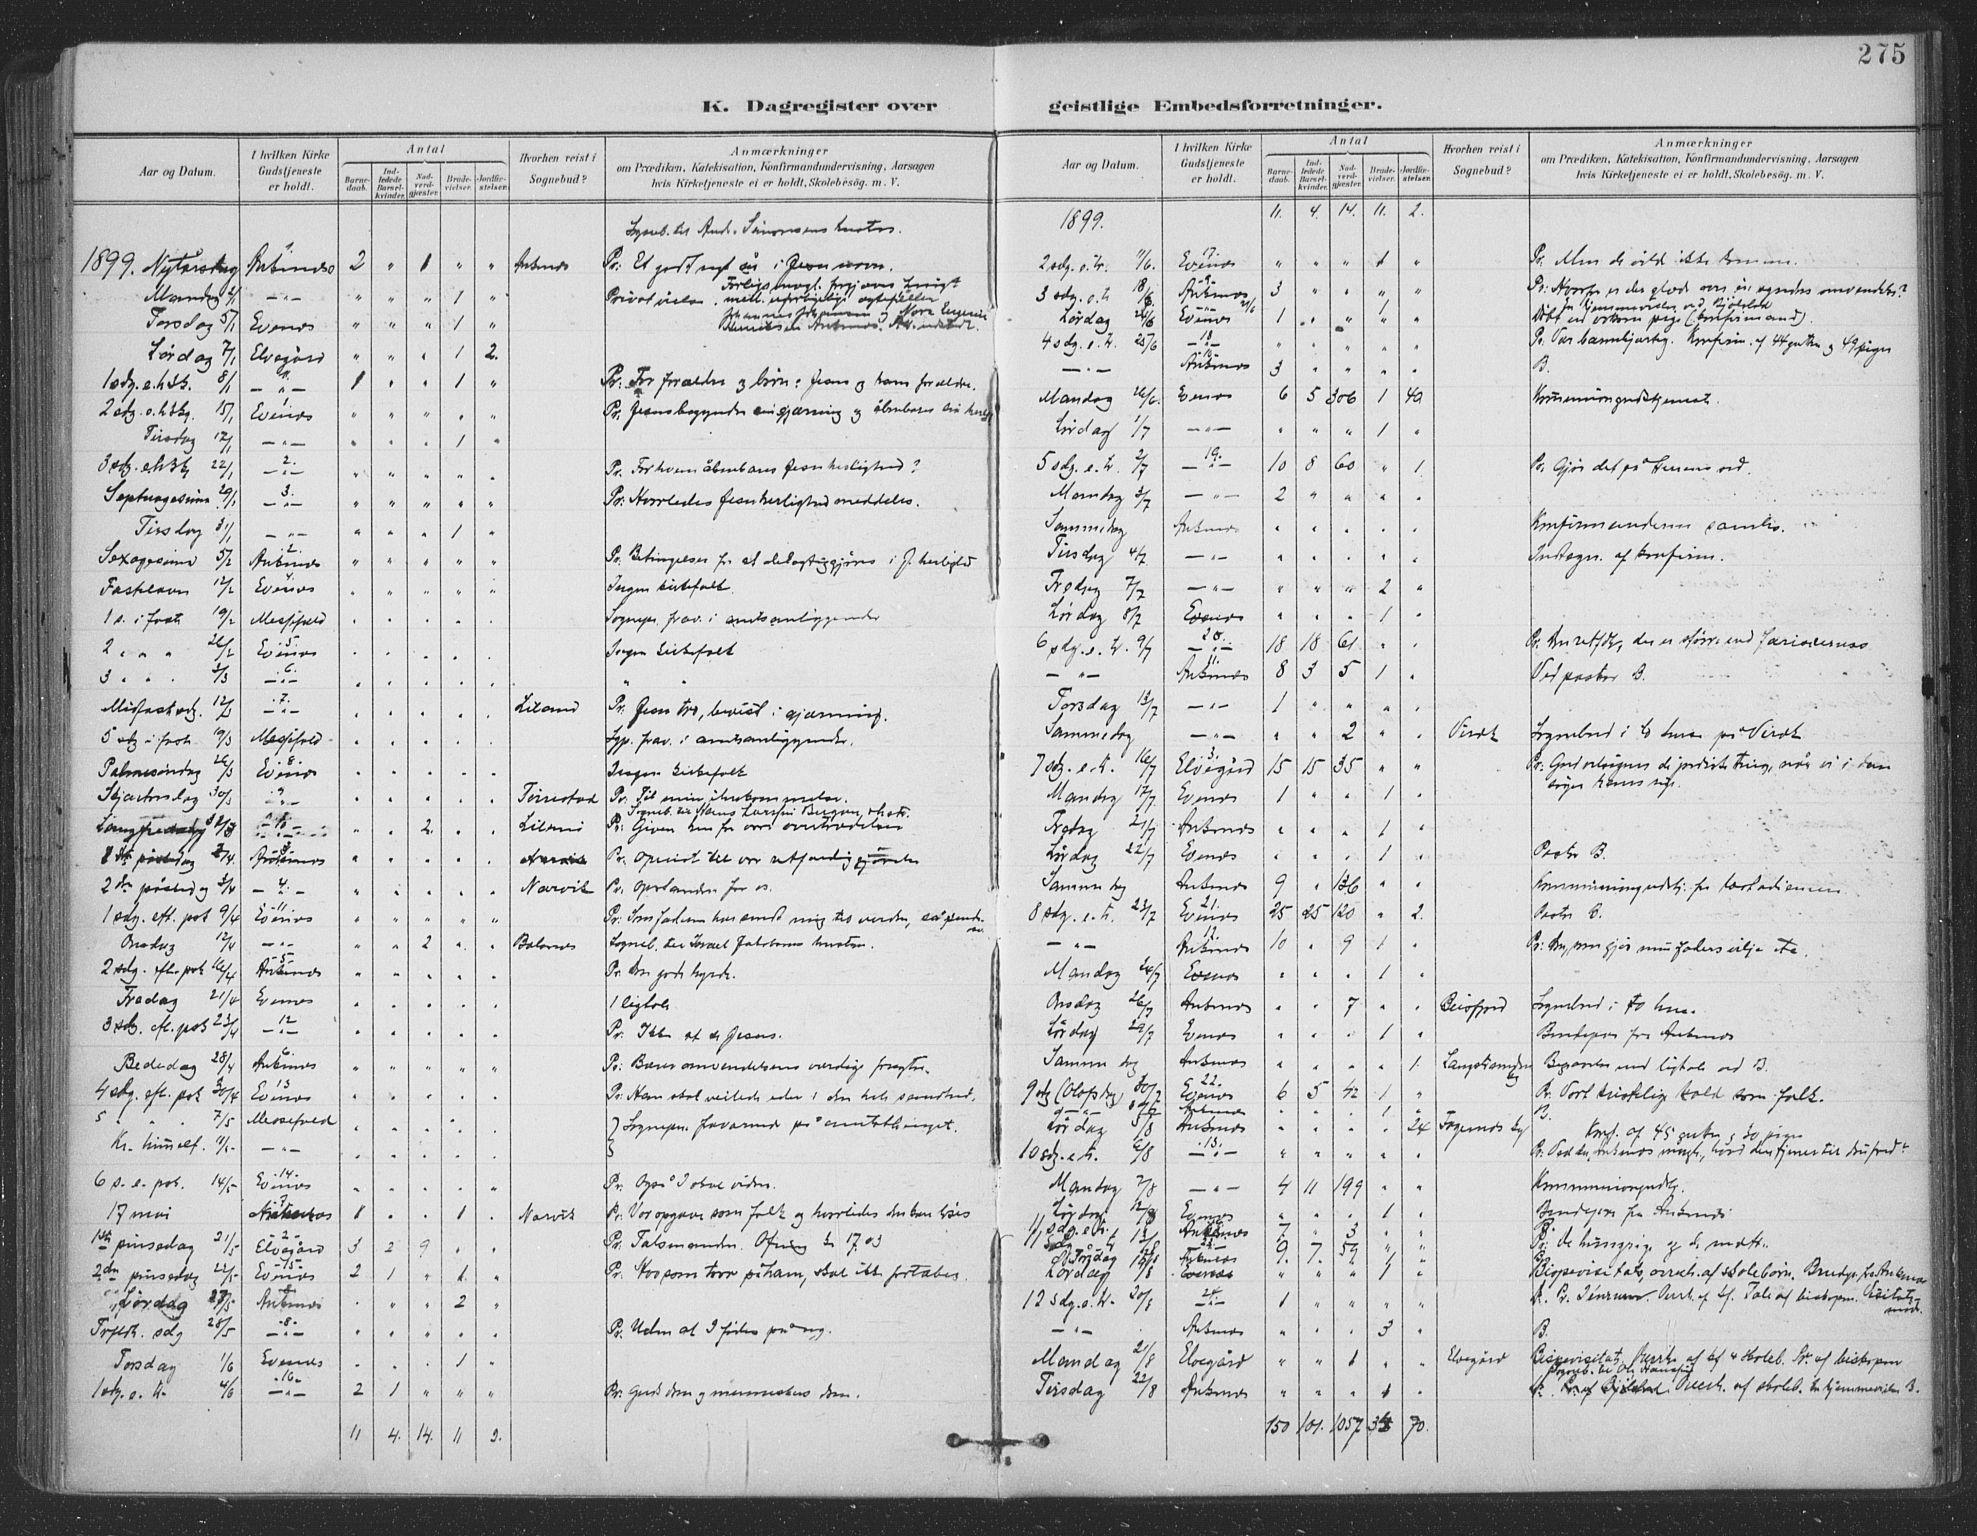 SAT, Ministerialprotokoller, klokkerbøker og fødselsregistre - Nordland, 863/L0899: Ministerialbok nr. 863A11, 1897-1906, s. 275